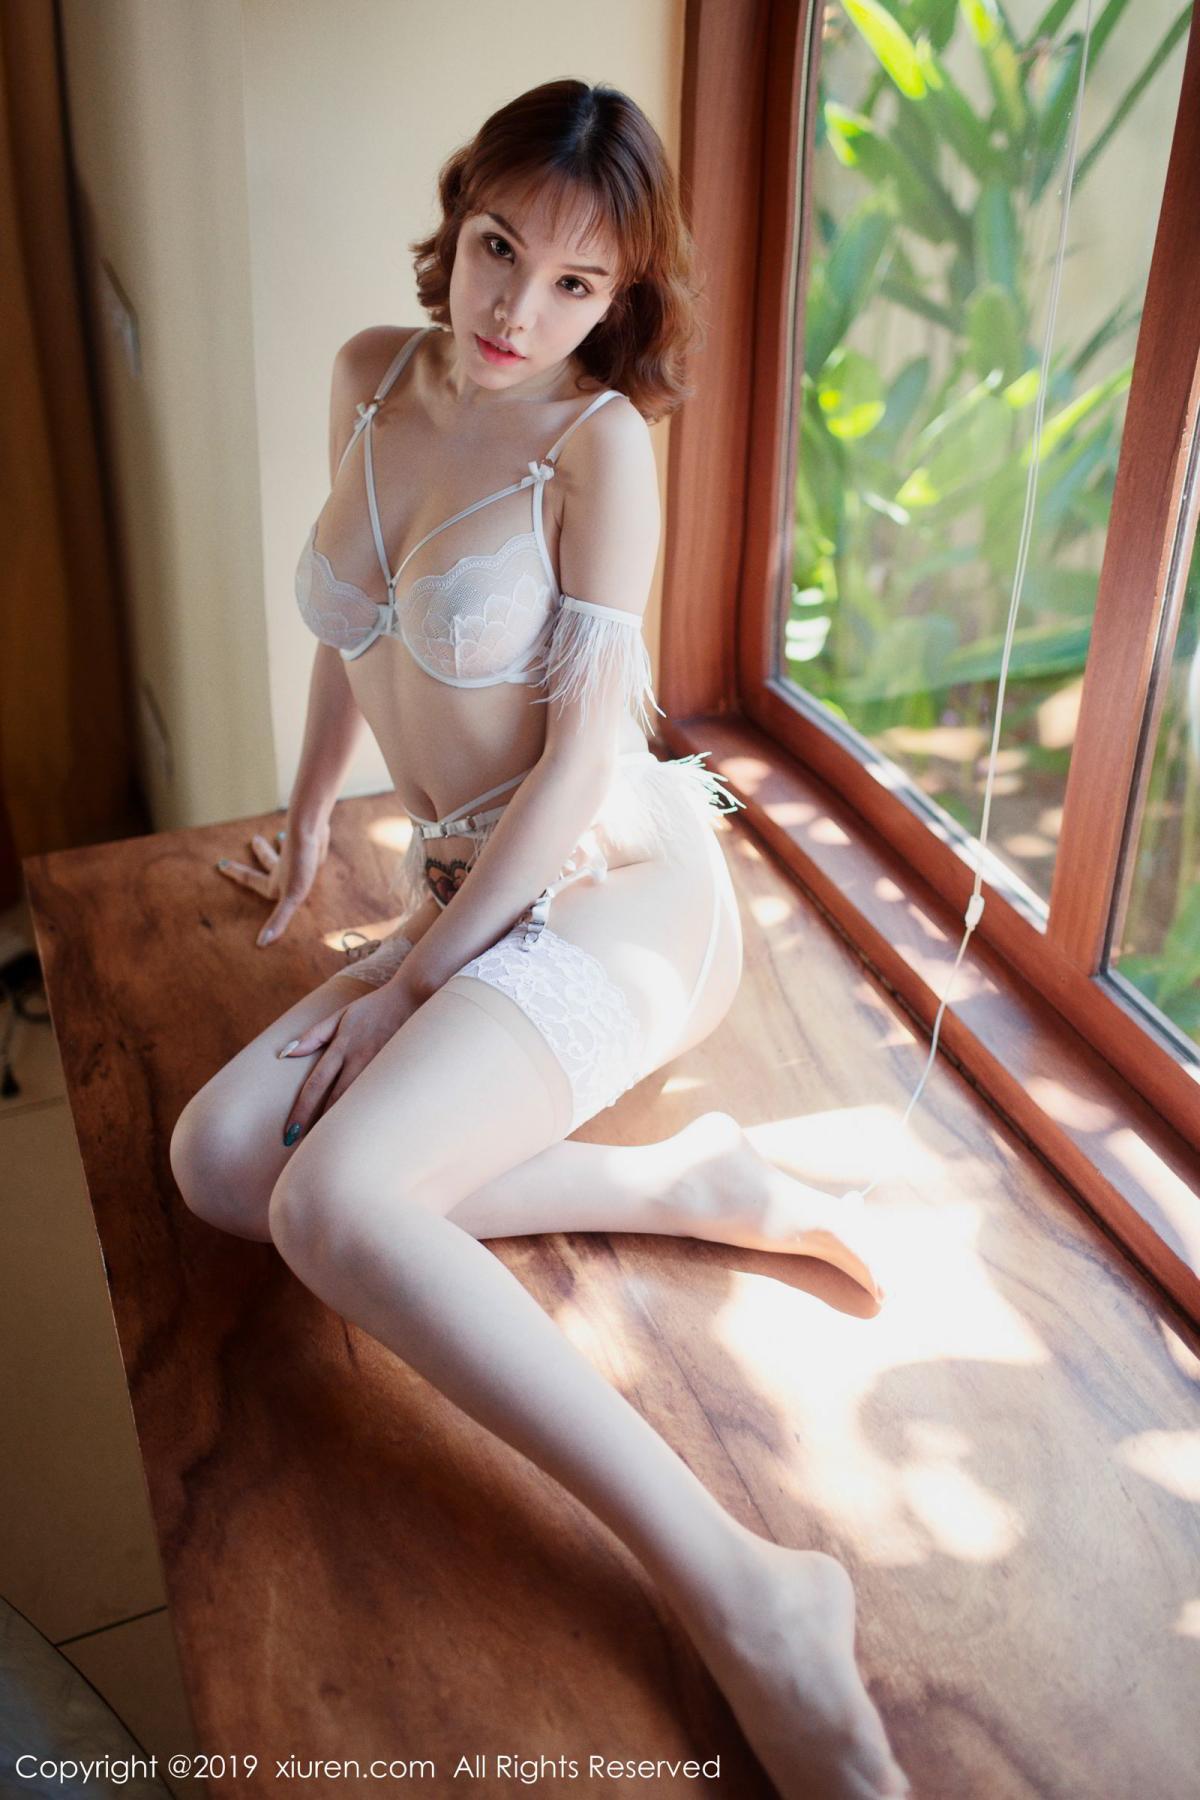 [XiuRen] Vol.1562 Huang Le Ran 8P, Huang Le Ran, Underwear, Xiuren